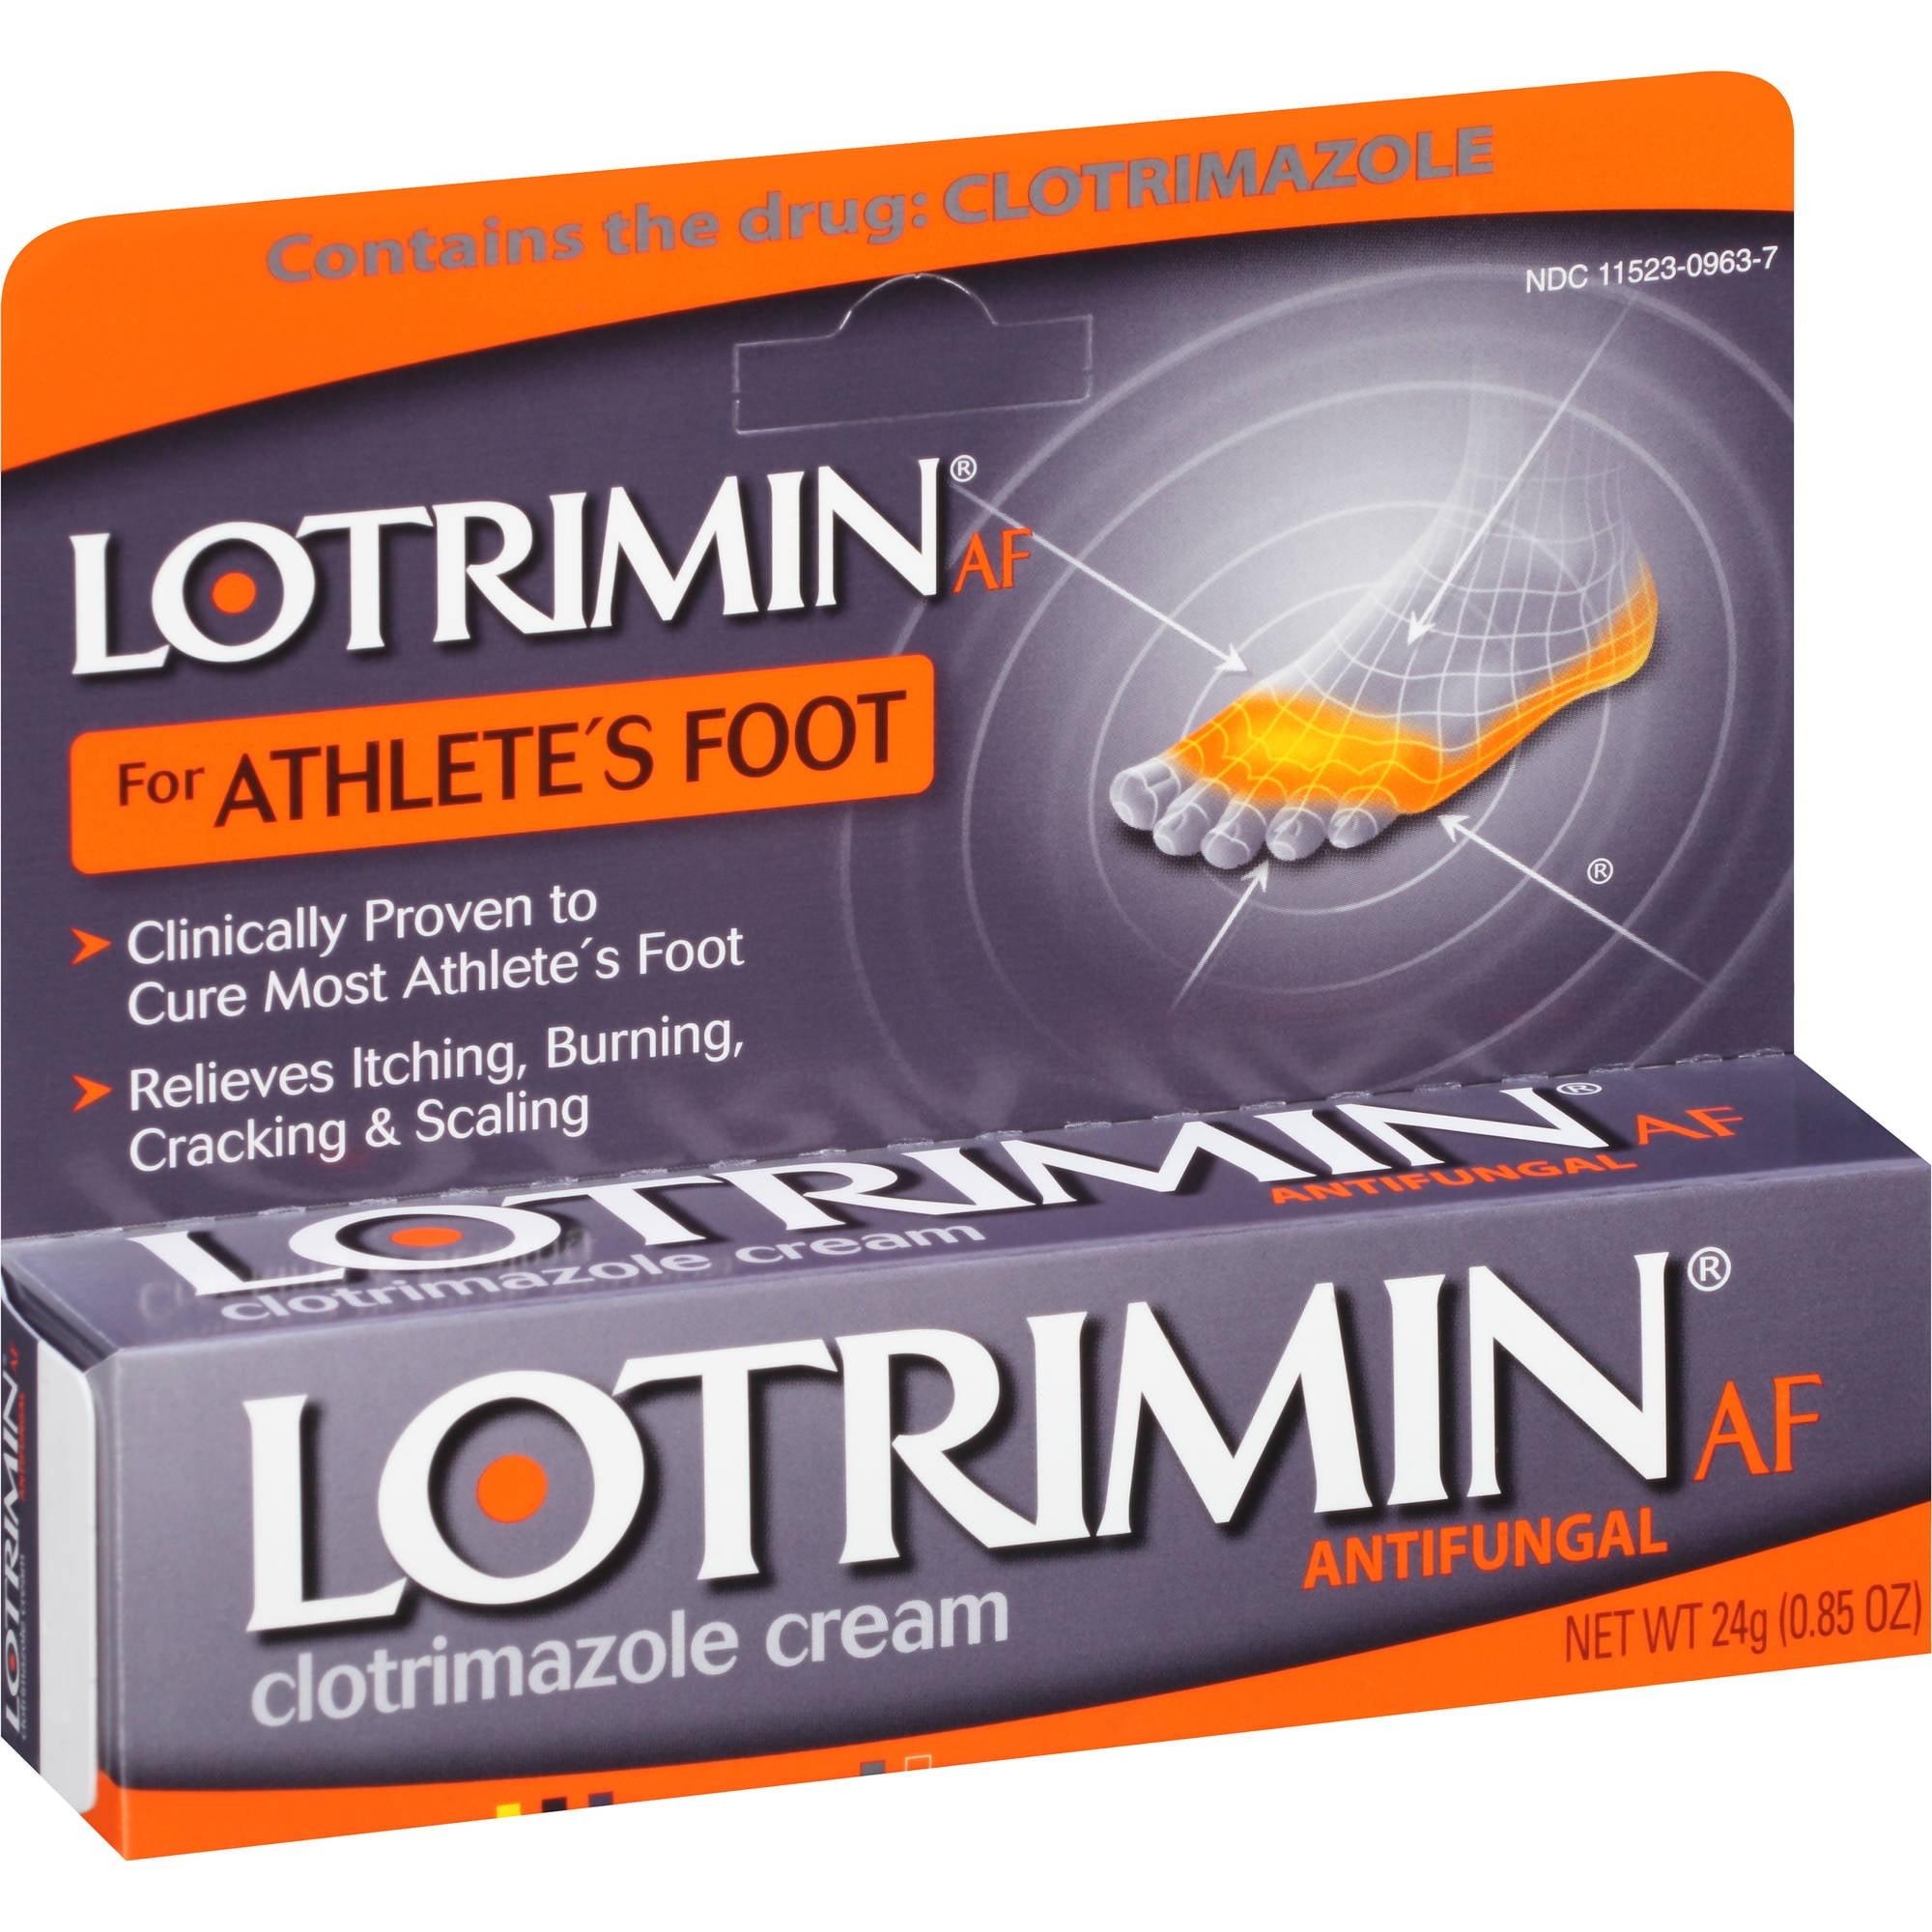 Lotrimin AF for Athlete's Foot Antifungal 1% Clotrimazole Cream, 0.85 oz